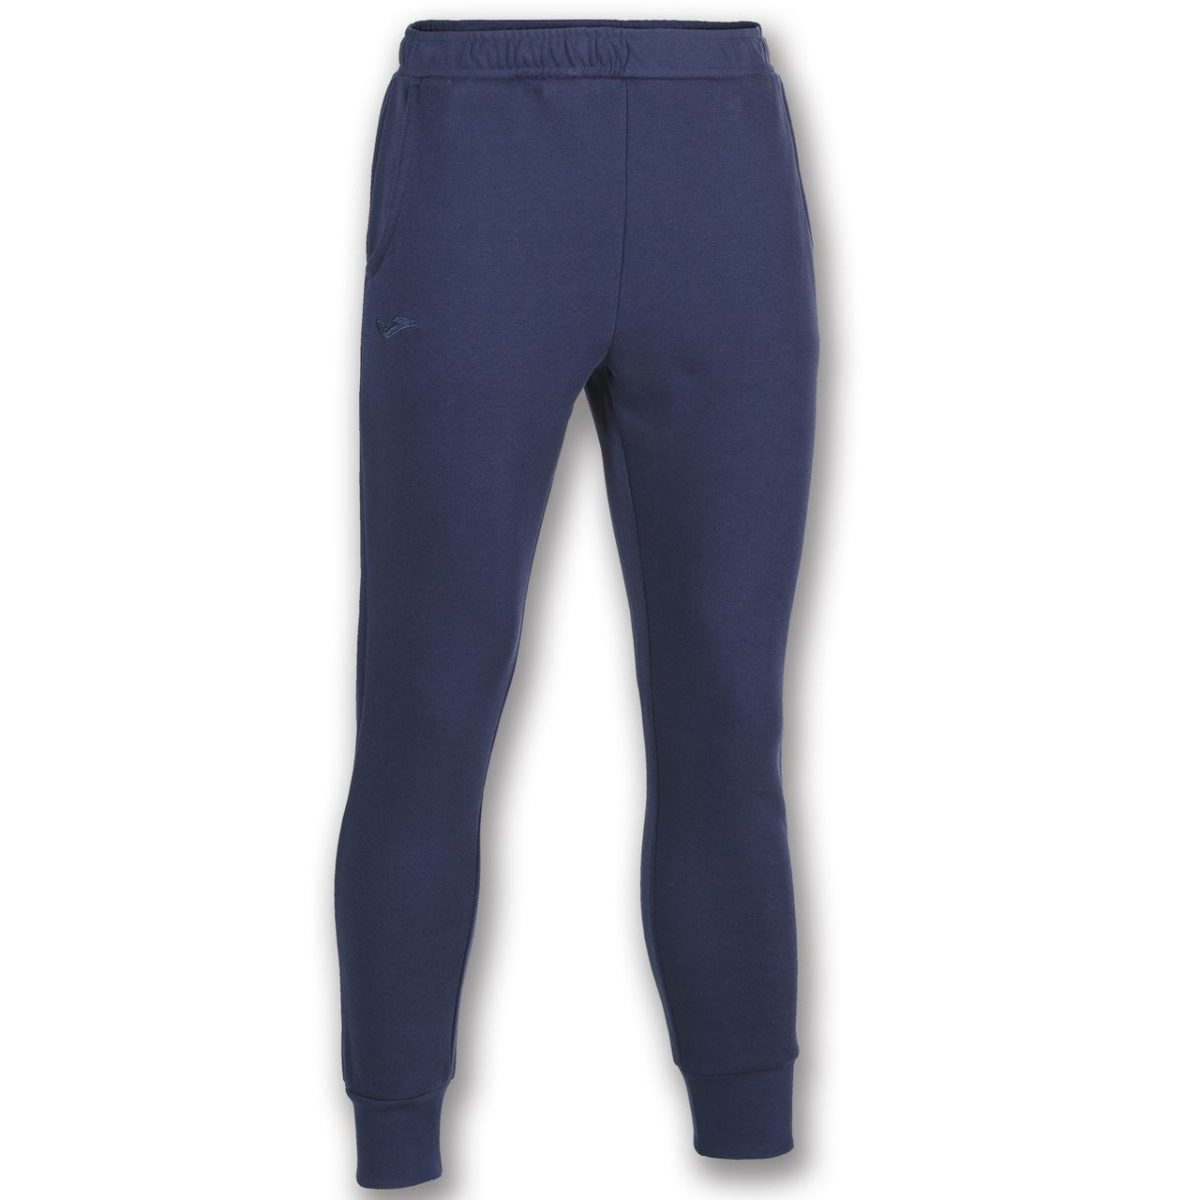 Joma Panteon II Cotton Long Pants Junior 100889